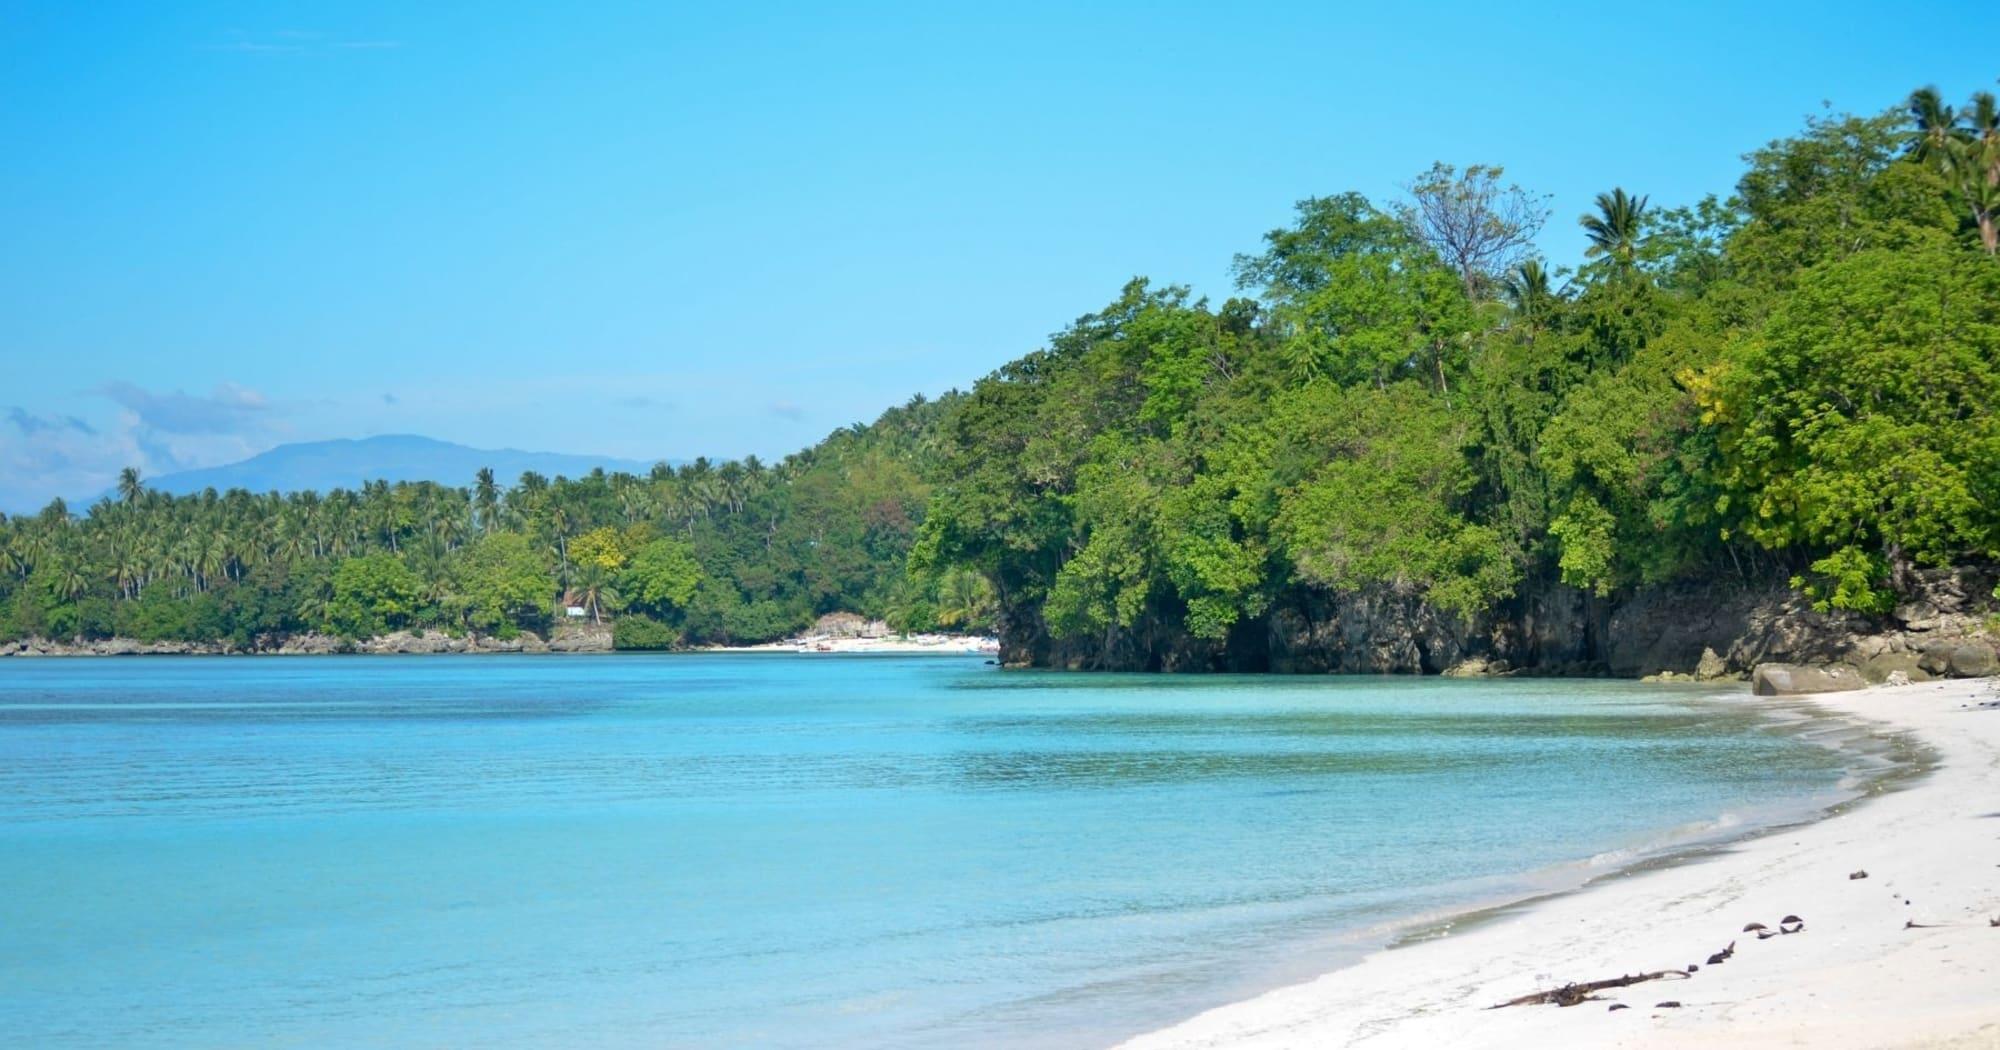 Mindanao's version of Boracay has opened its doors to local tourists